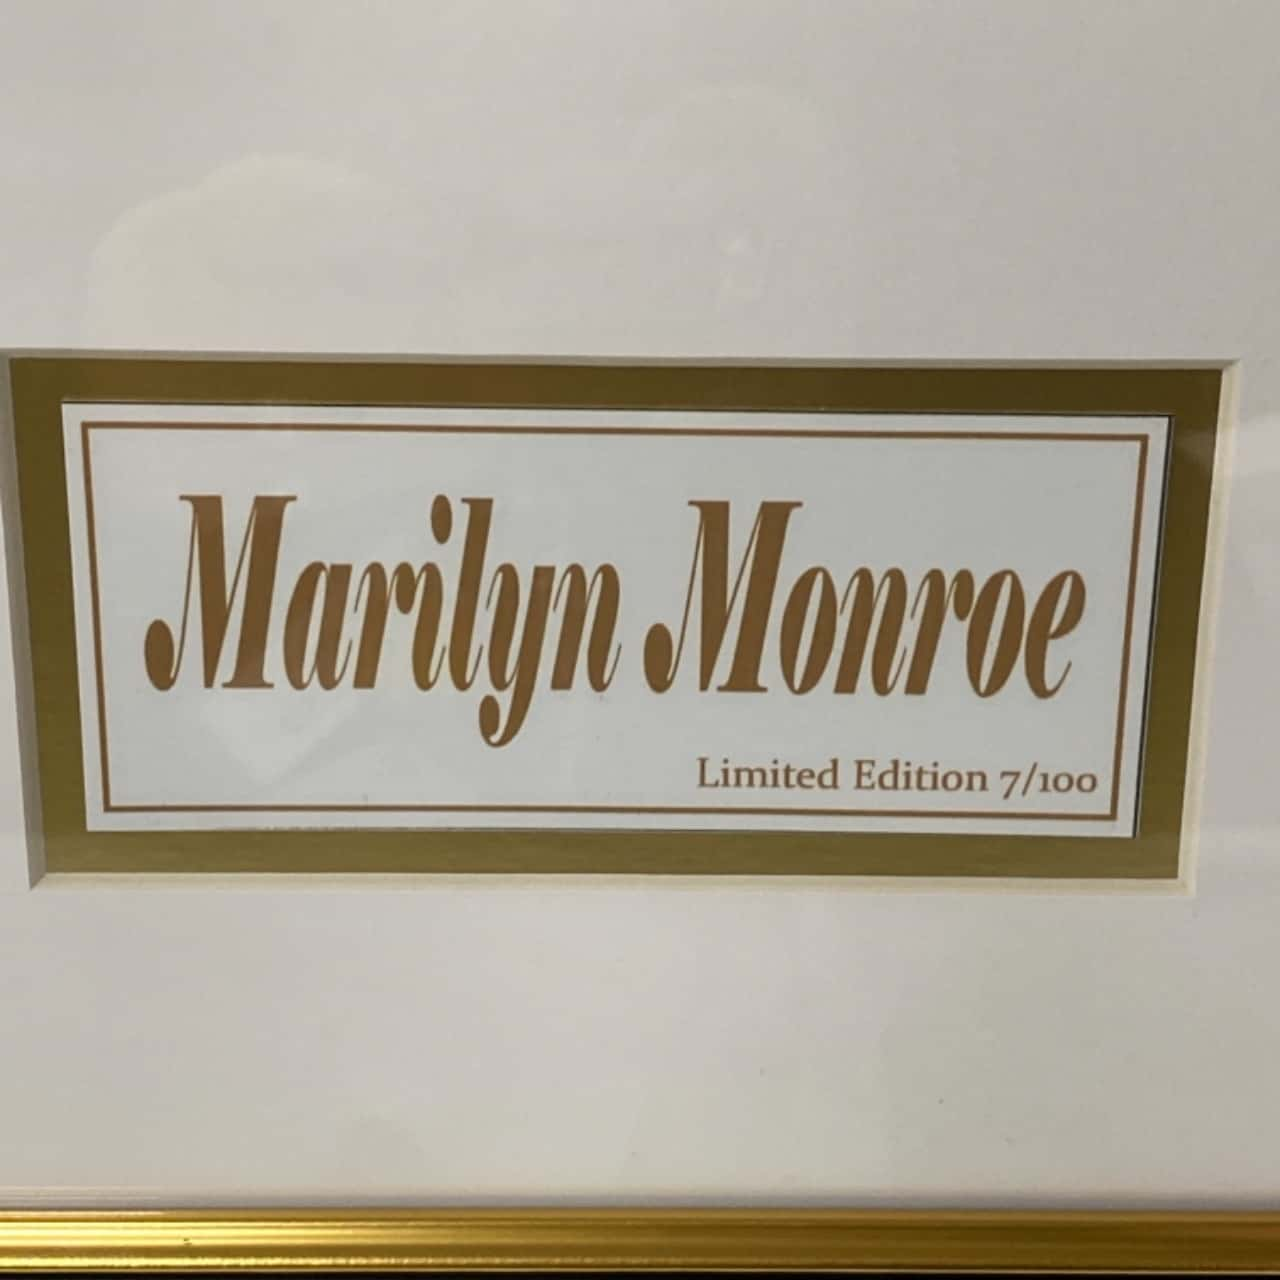 Marilyn Monroe limited edition print